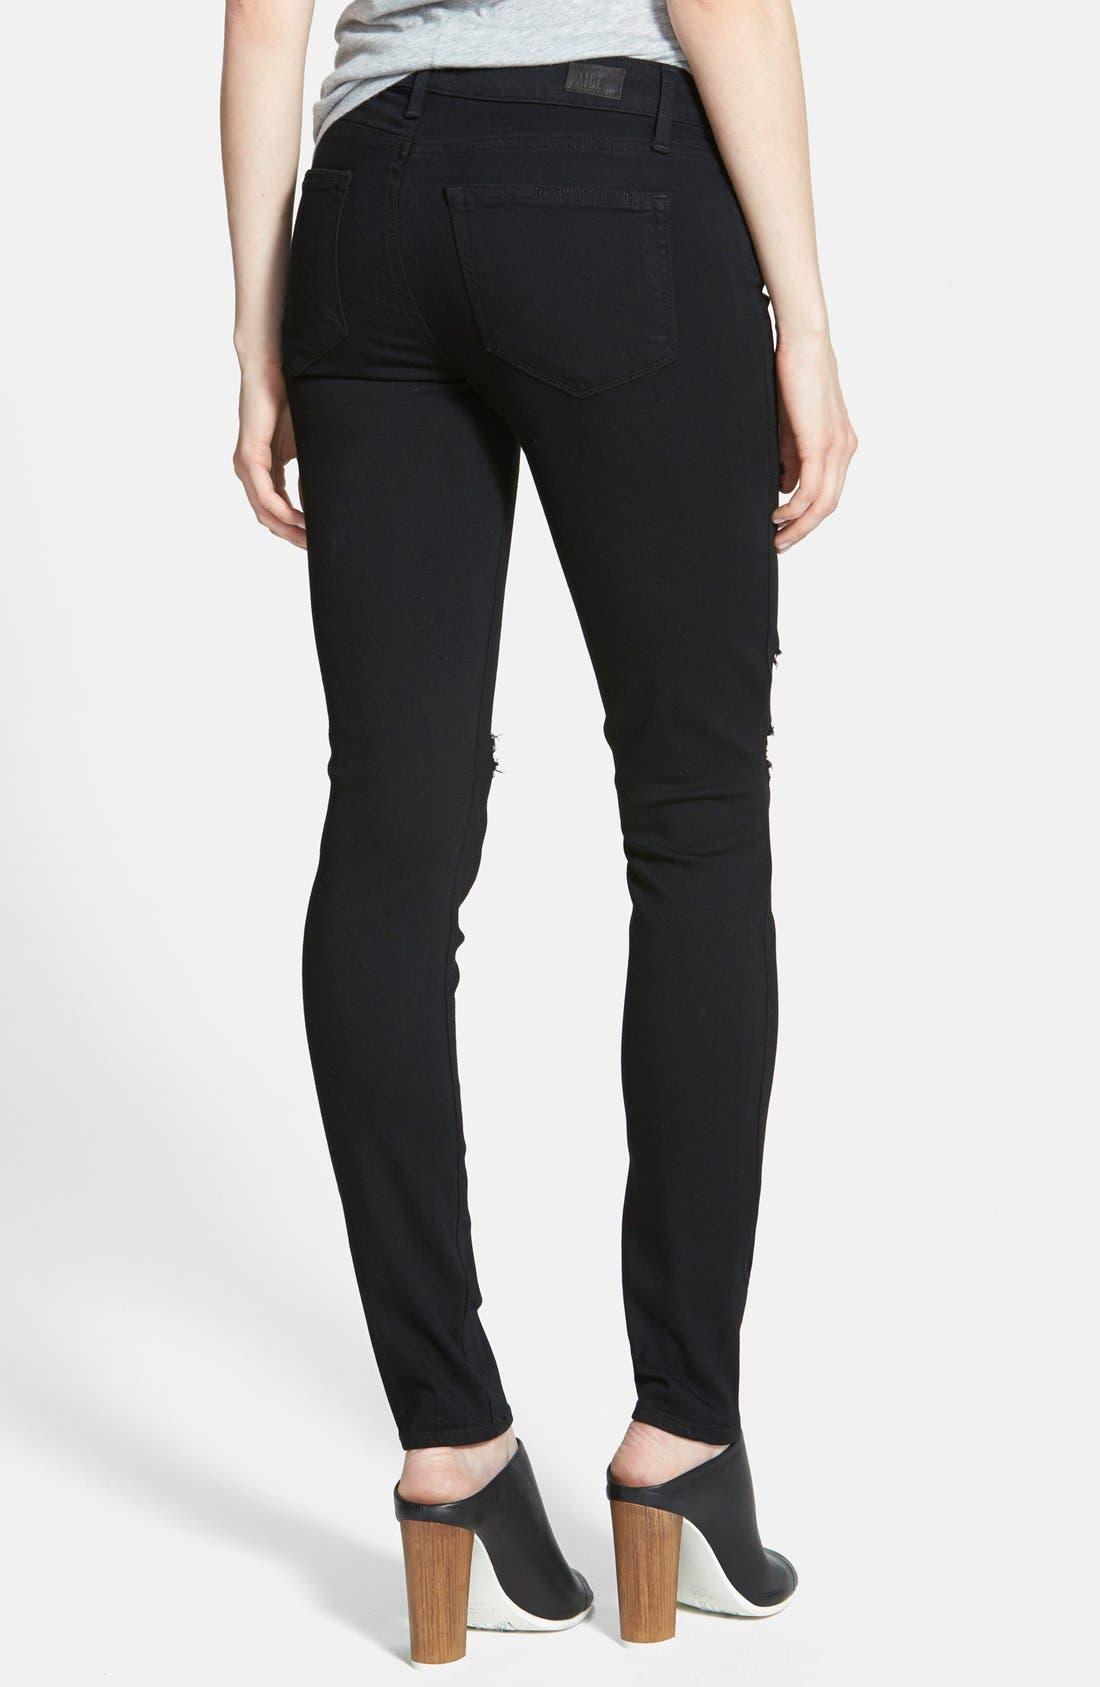 Transcend - Verdugo Ultra Skinny Jeans,                             Alternate thumbnail 2, color,                             Black Destructed